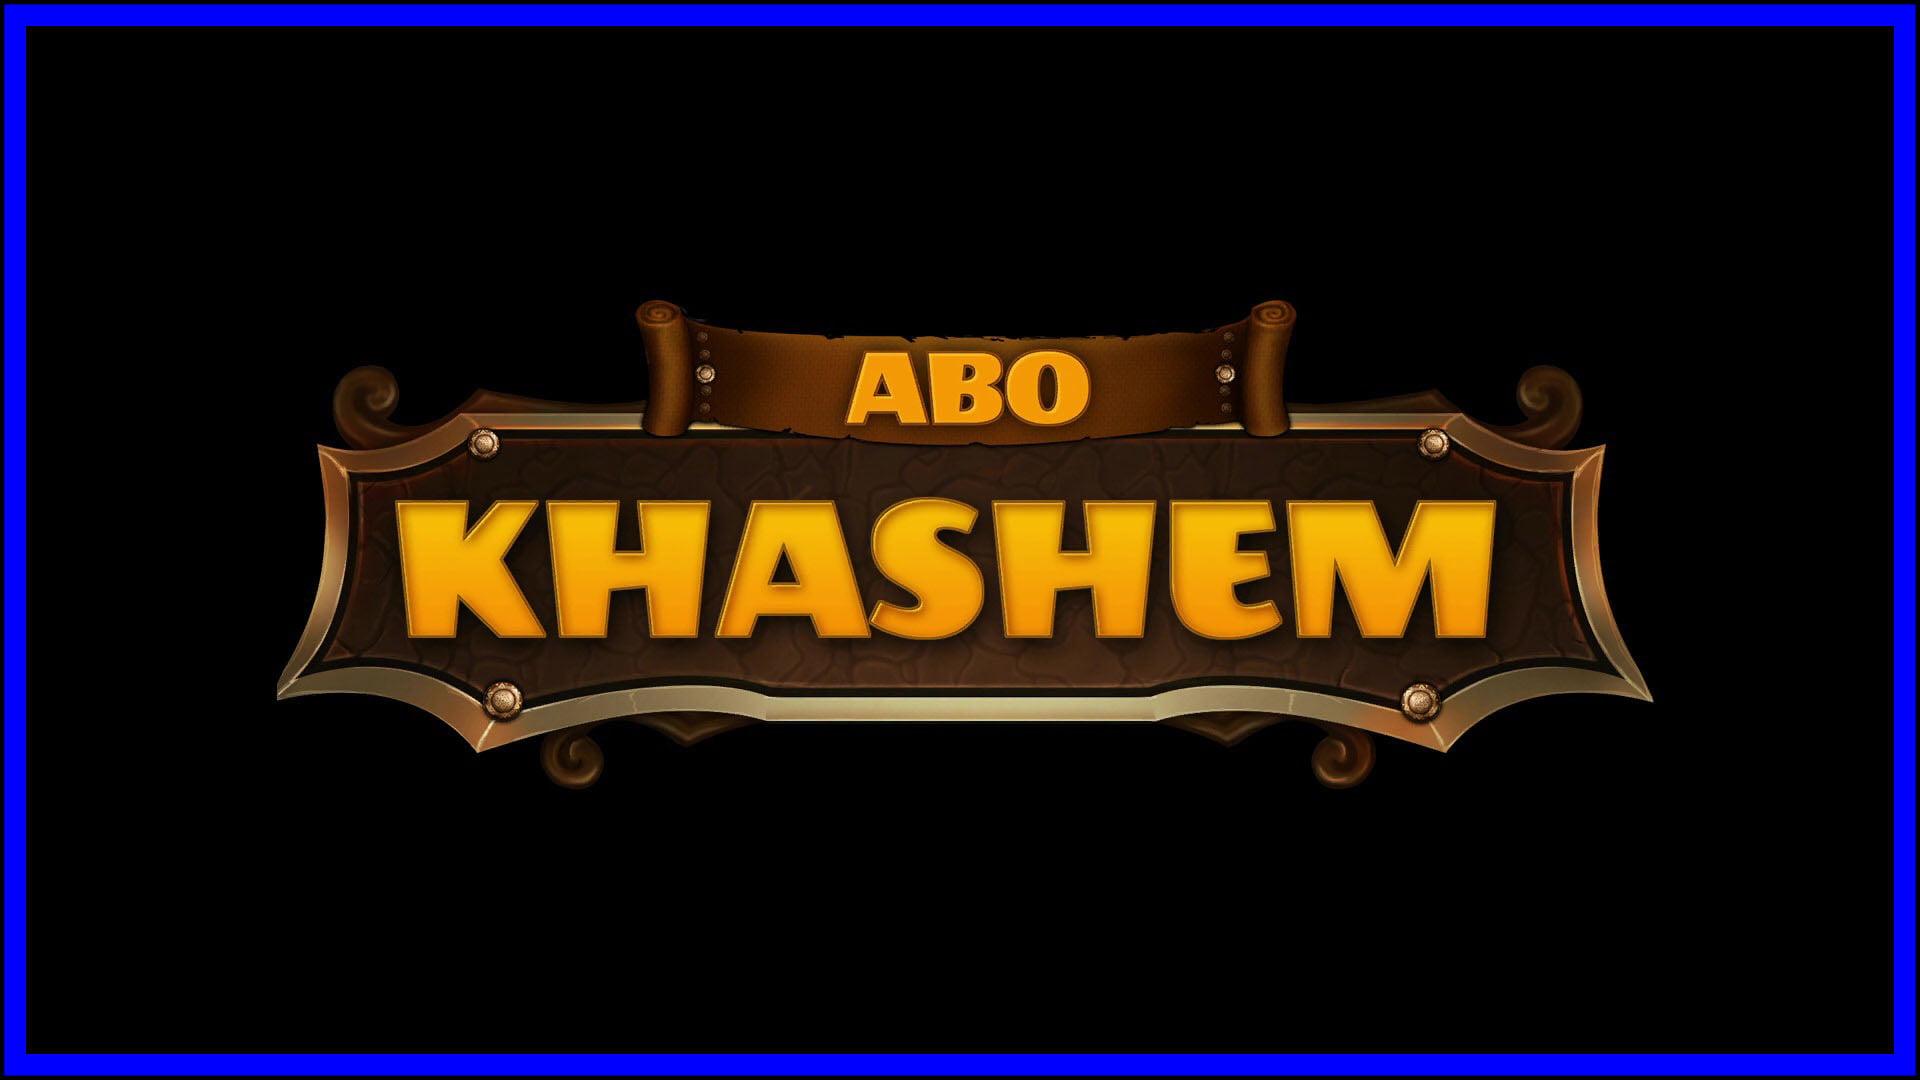 Abo Khashem Fi3